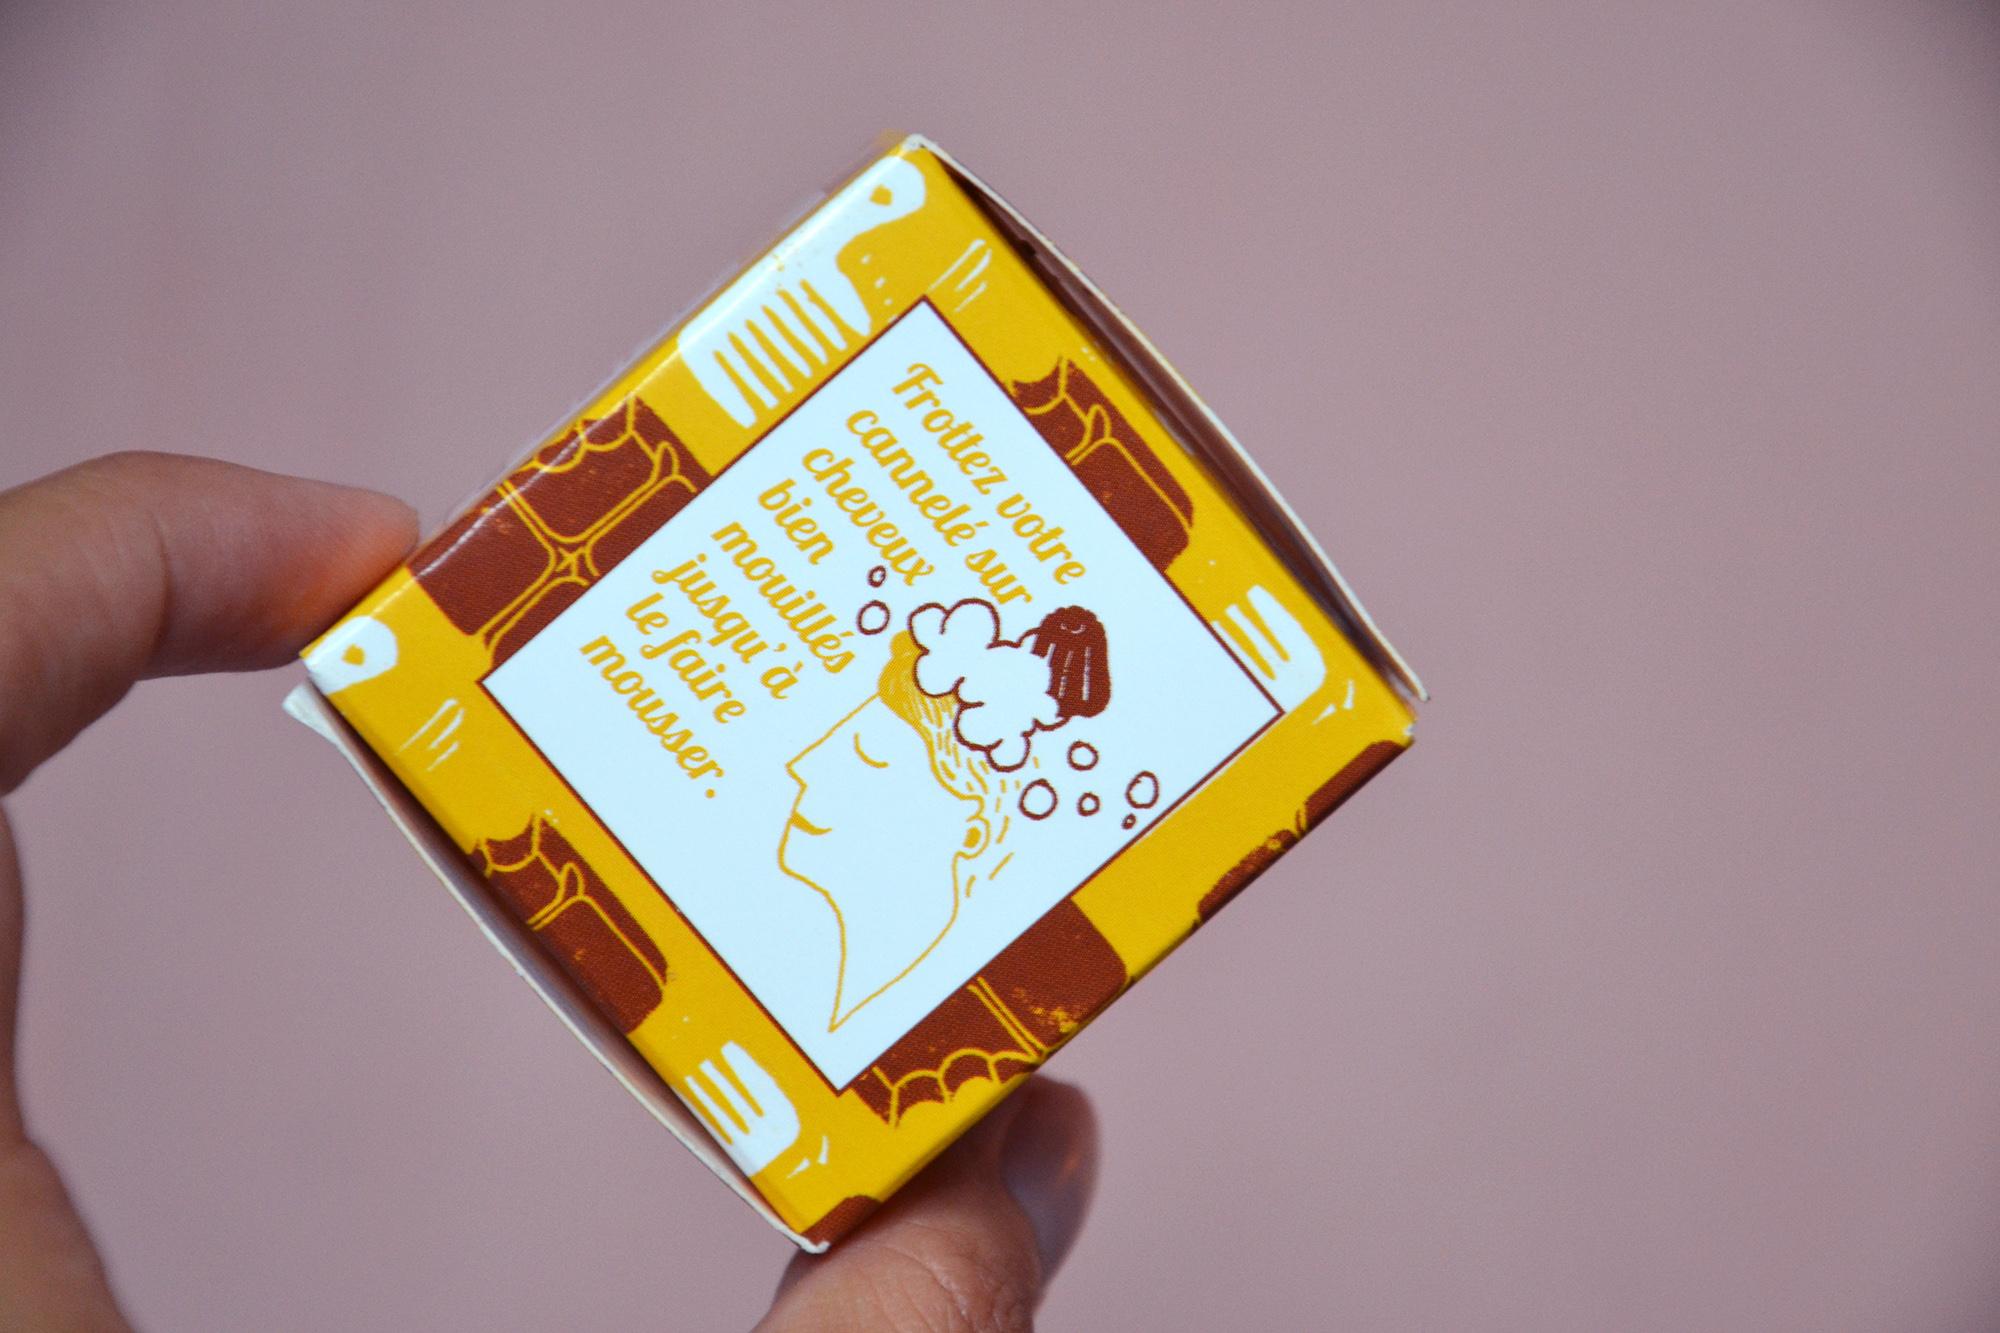 shampoing-solide-lamazuna-avis-5